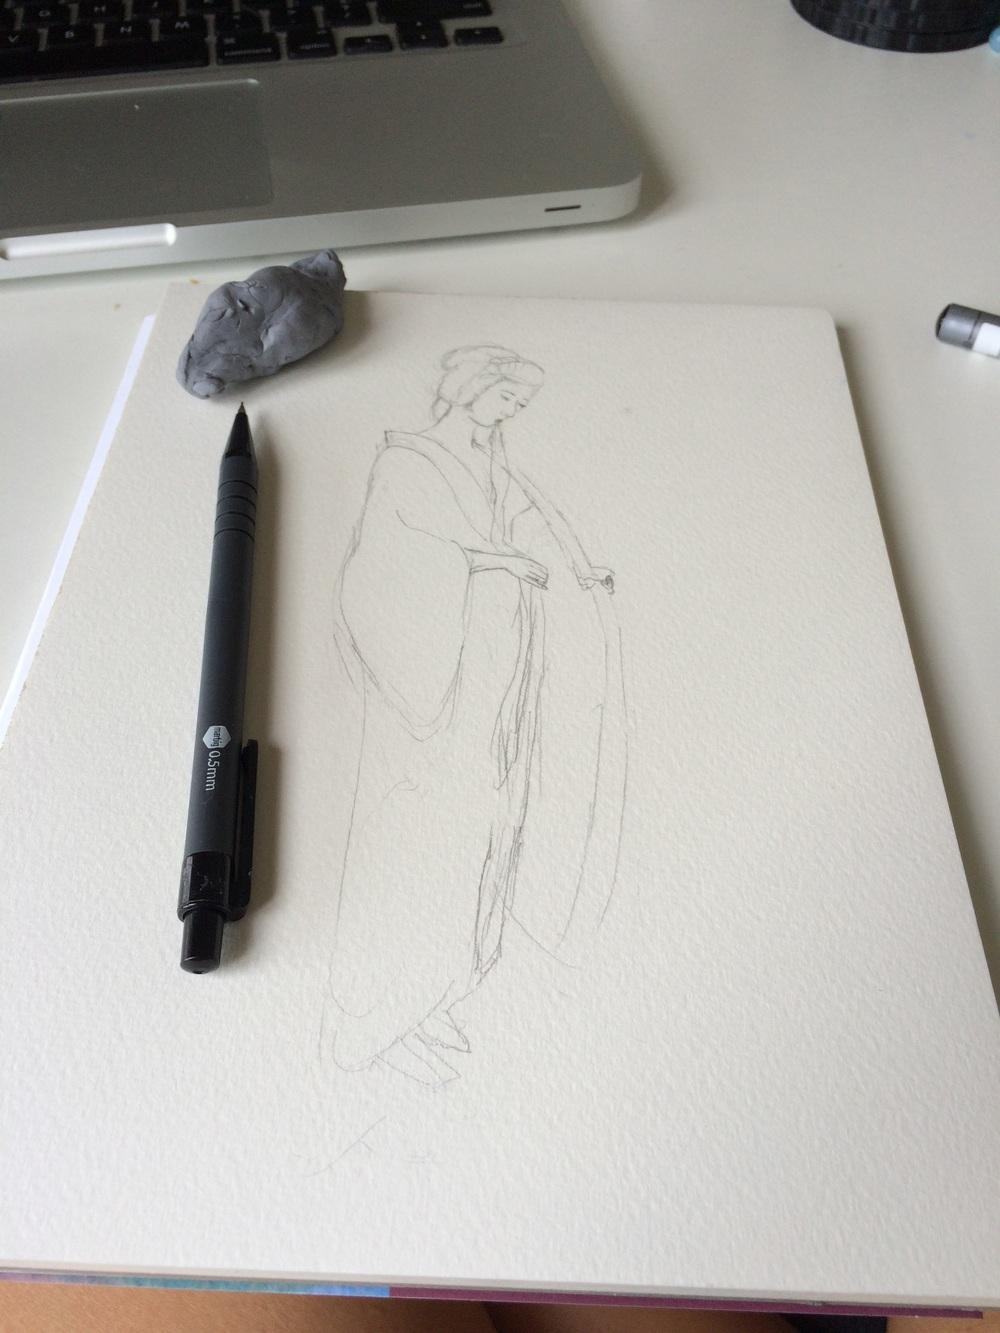 Initial pencil sketch.